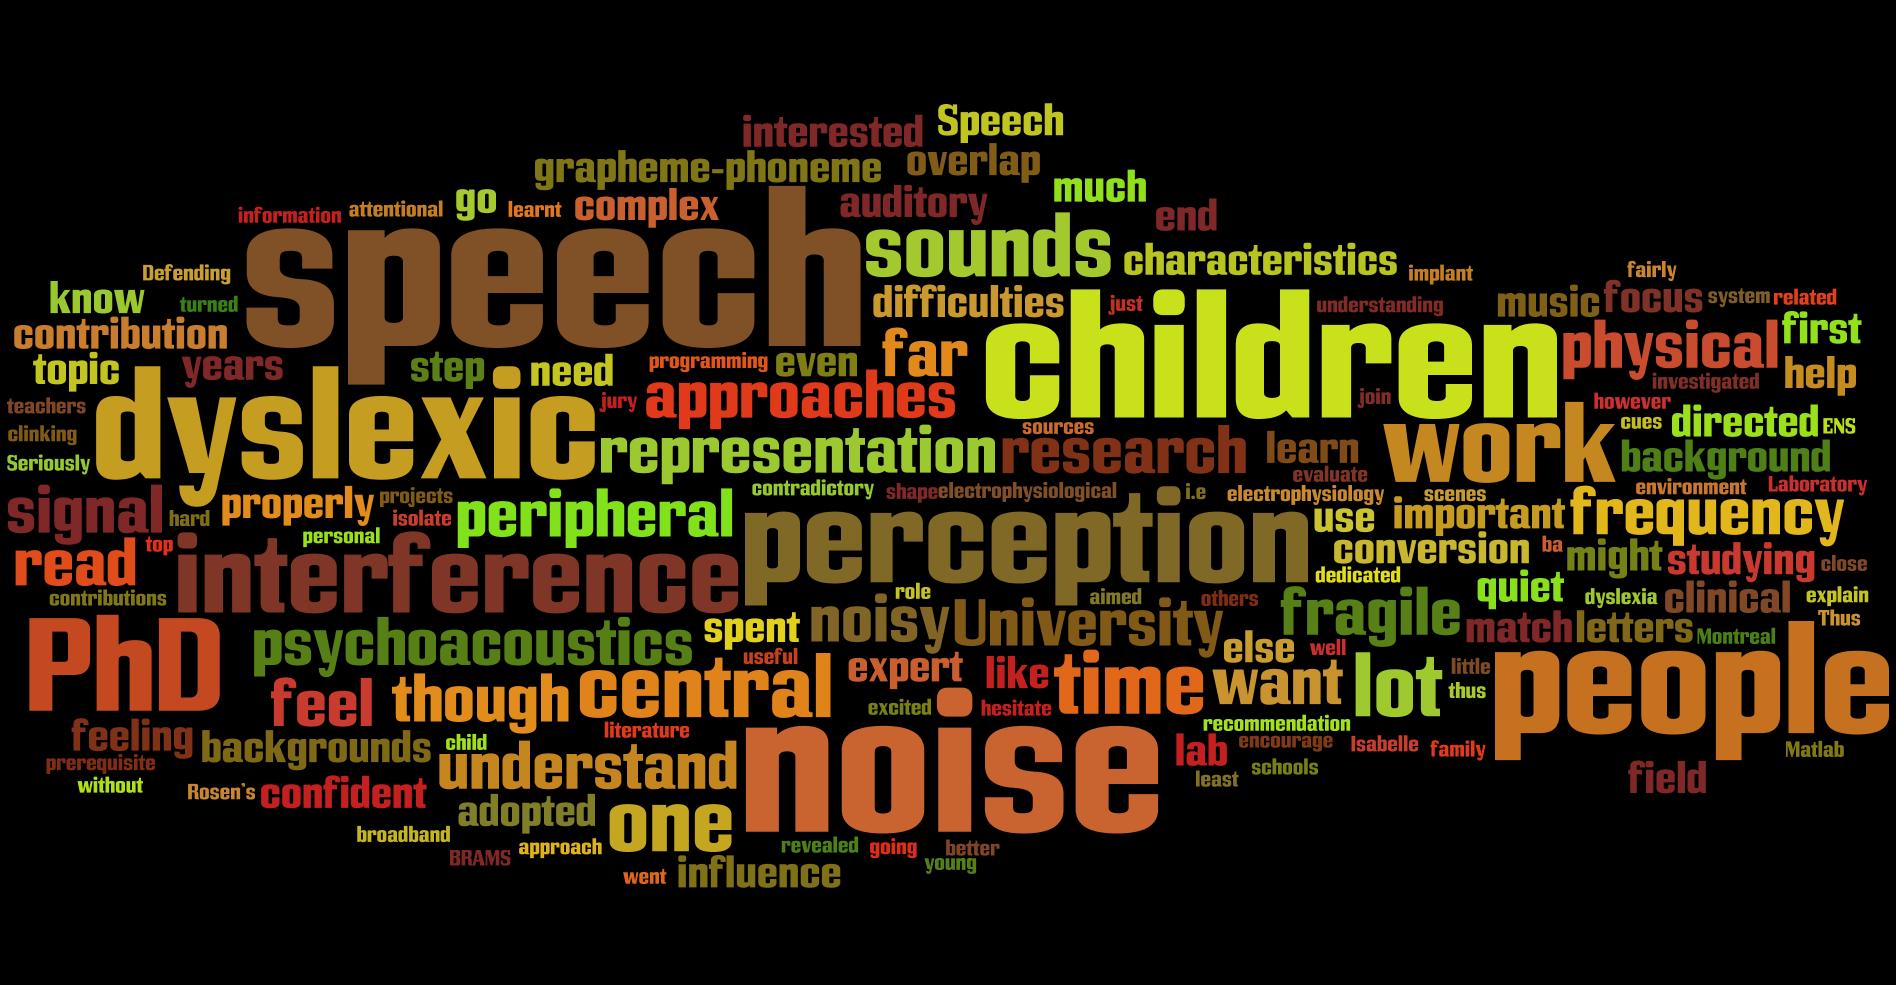 Axelle Calcus on speech perception in noise